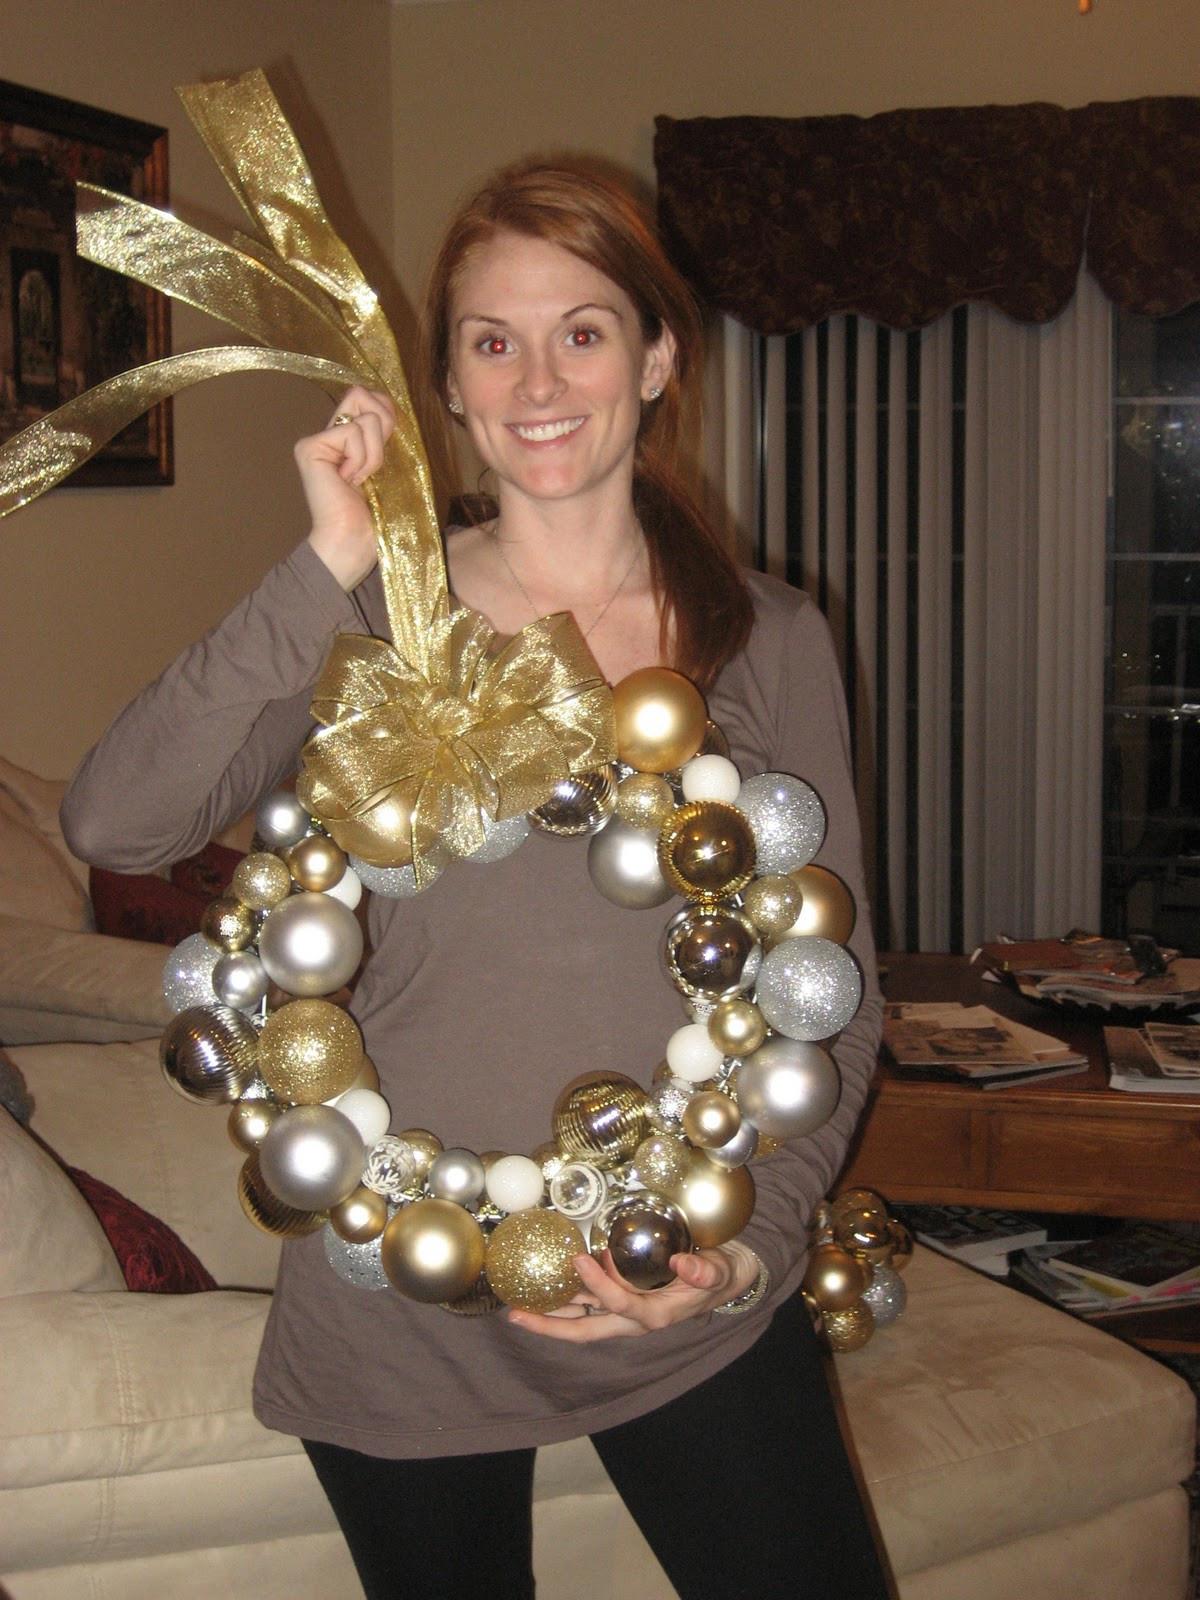 Christmas Ball Wreath DIY  DIY Christmas Ornament Wreath – fy Cozy Couture